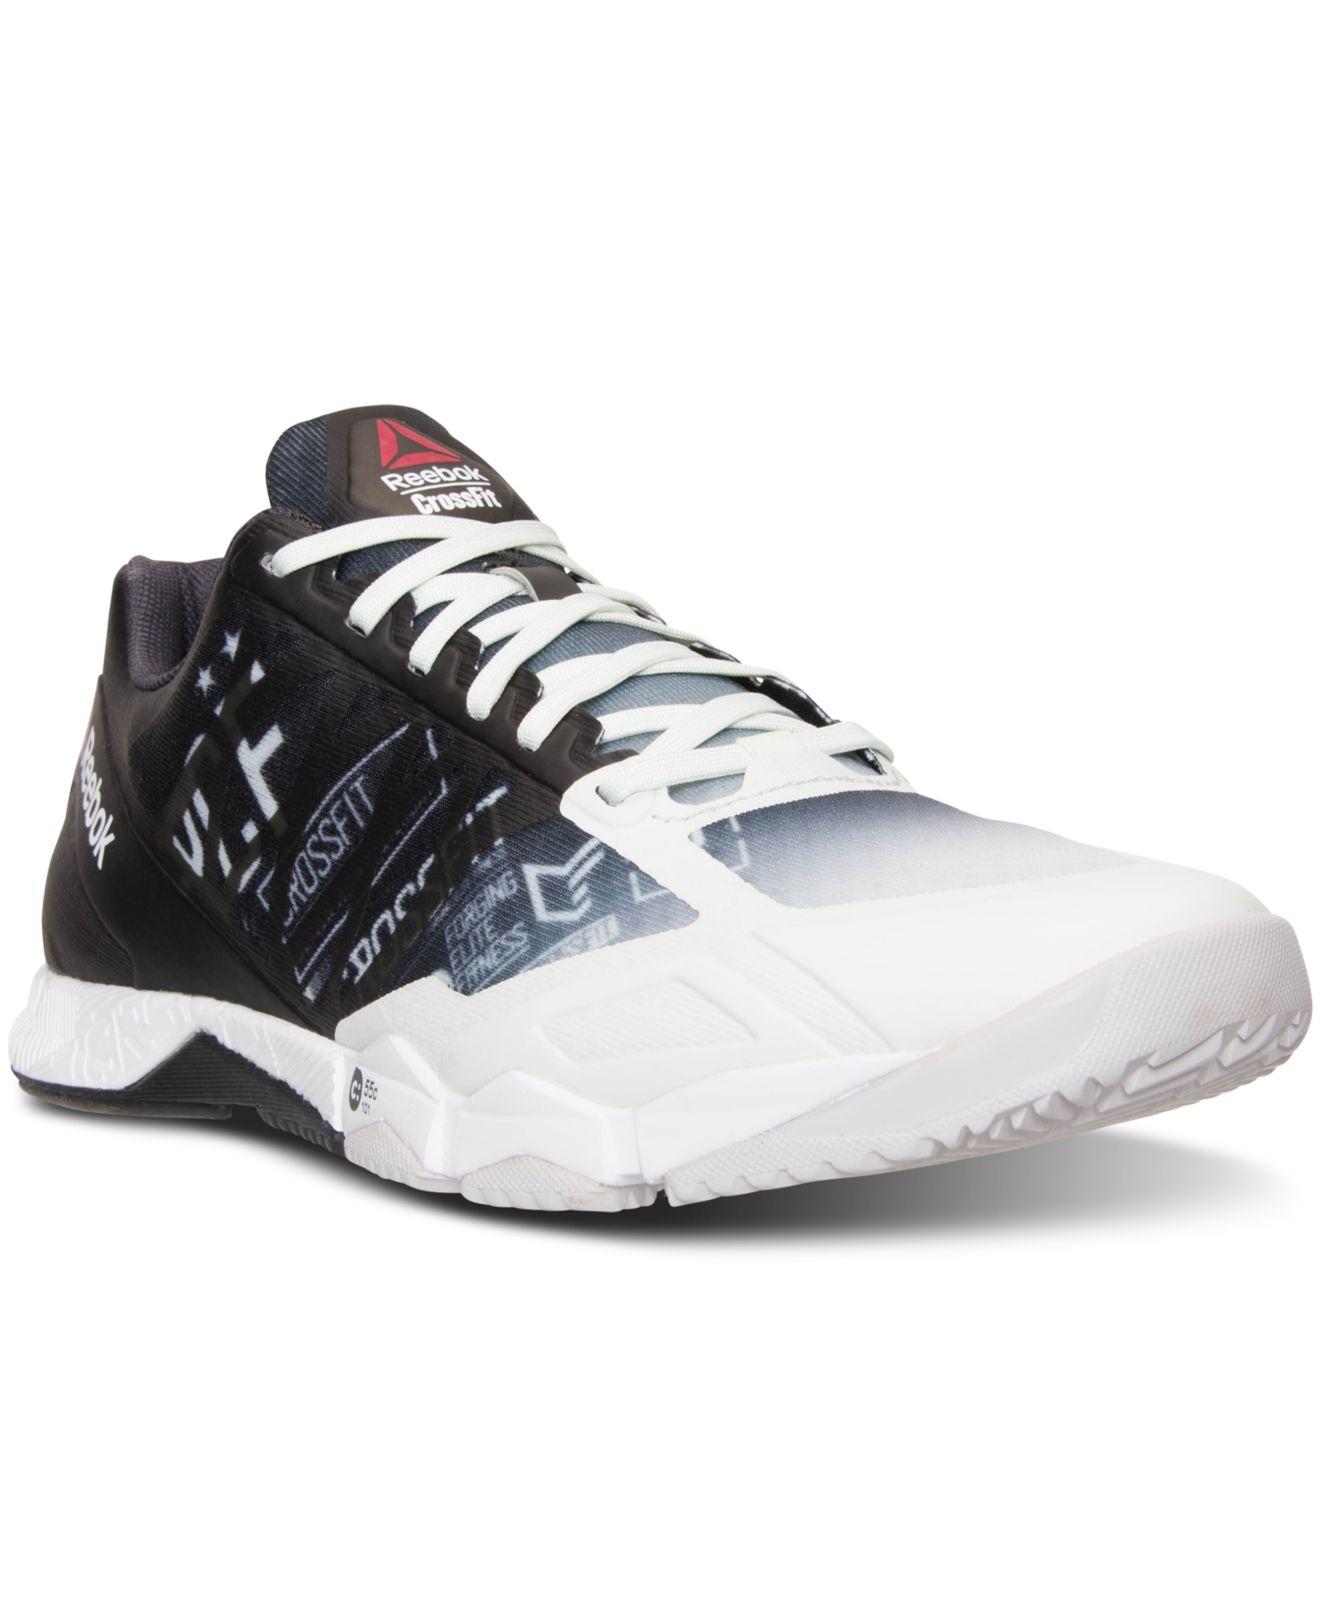 5924d1b772e60f Lyst - Reebok Men s Crossfit Speed Tr Training Sneakers From Finish ...